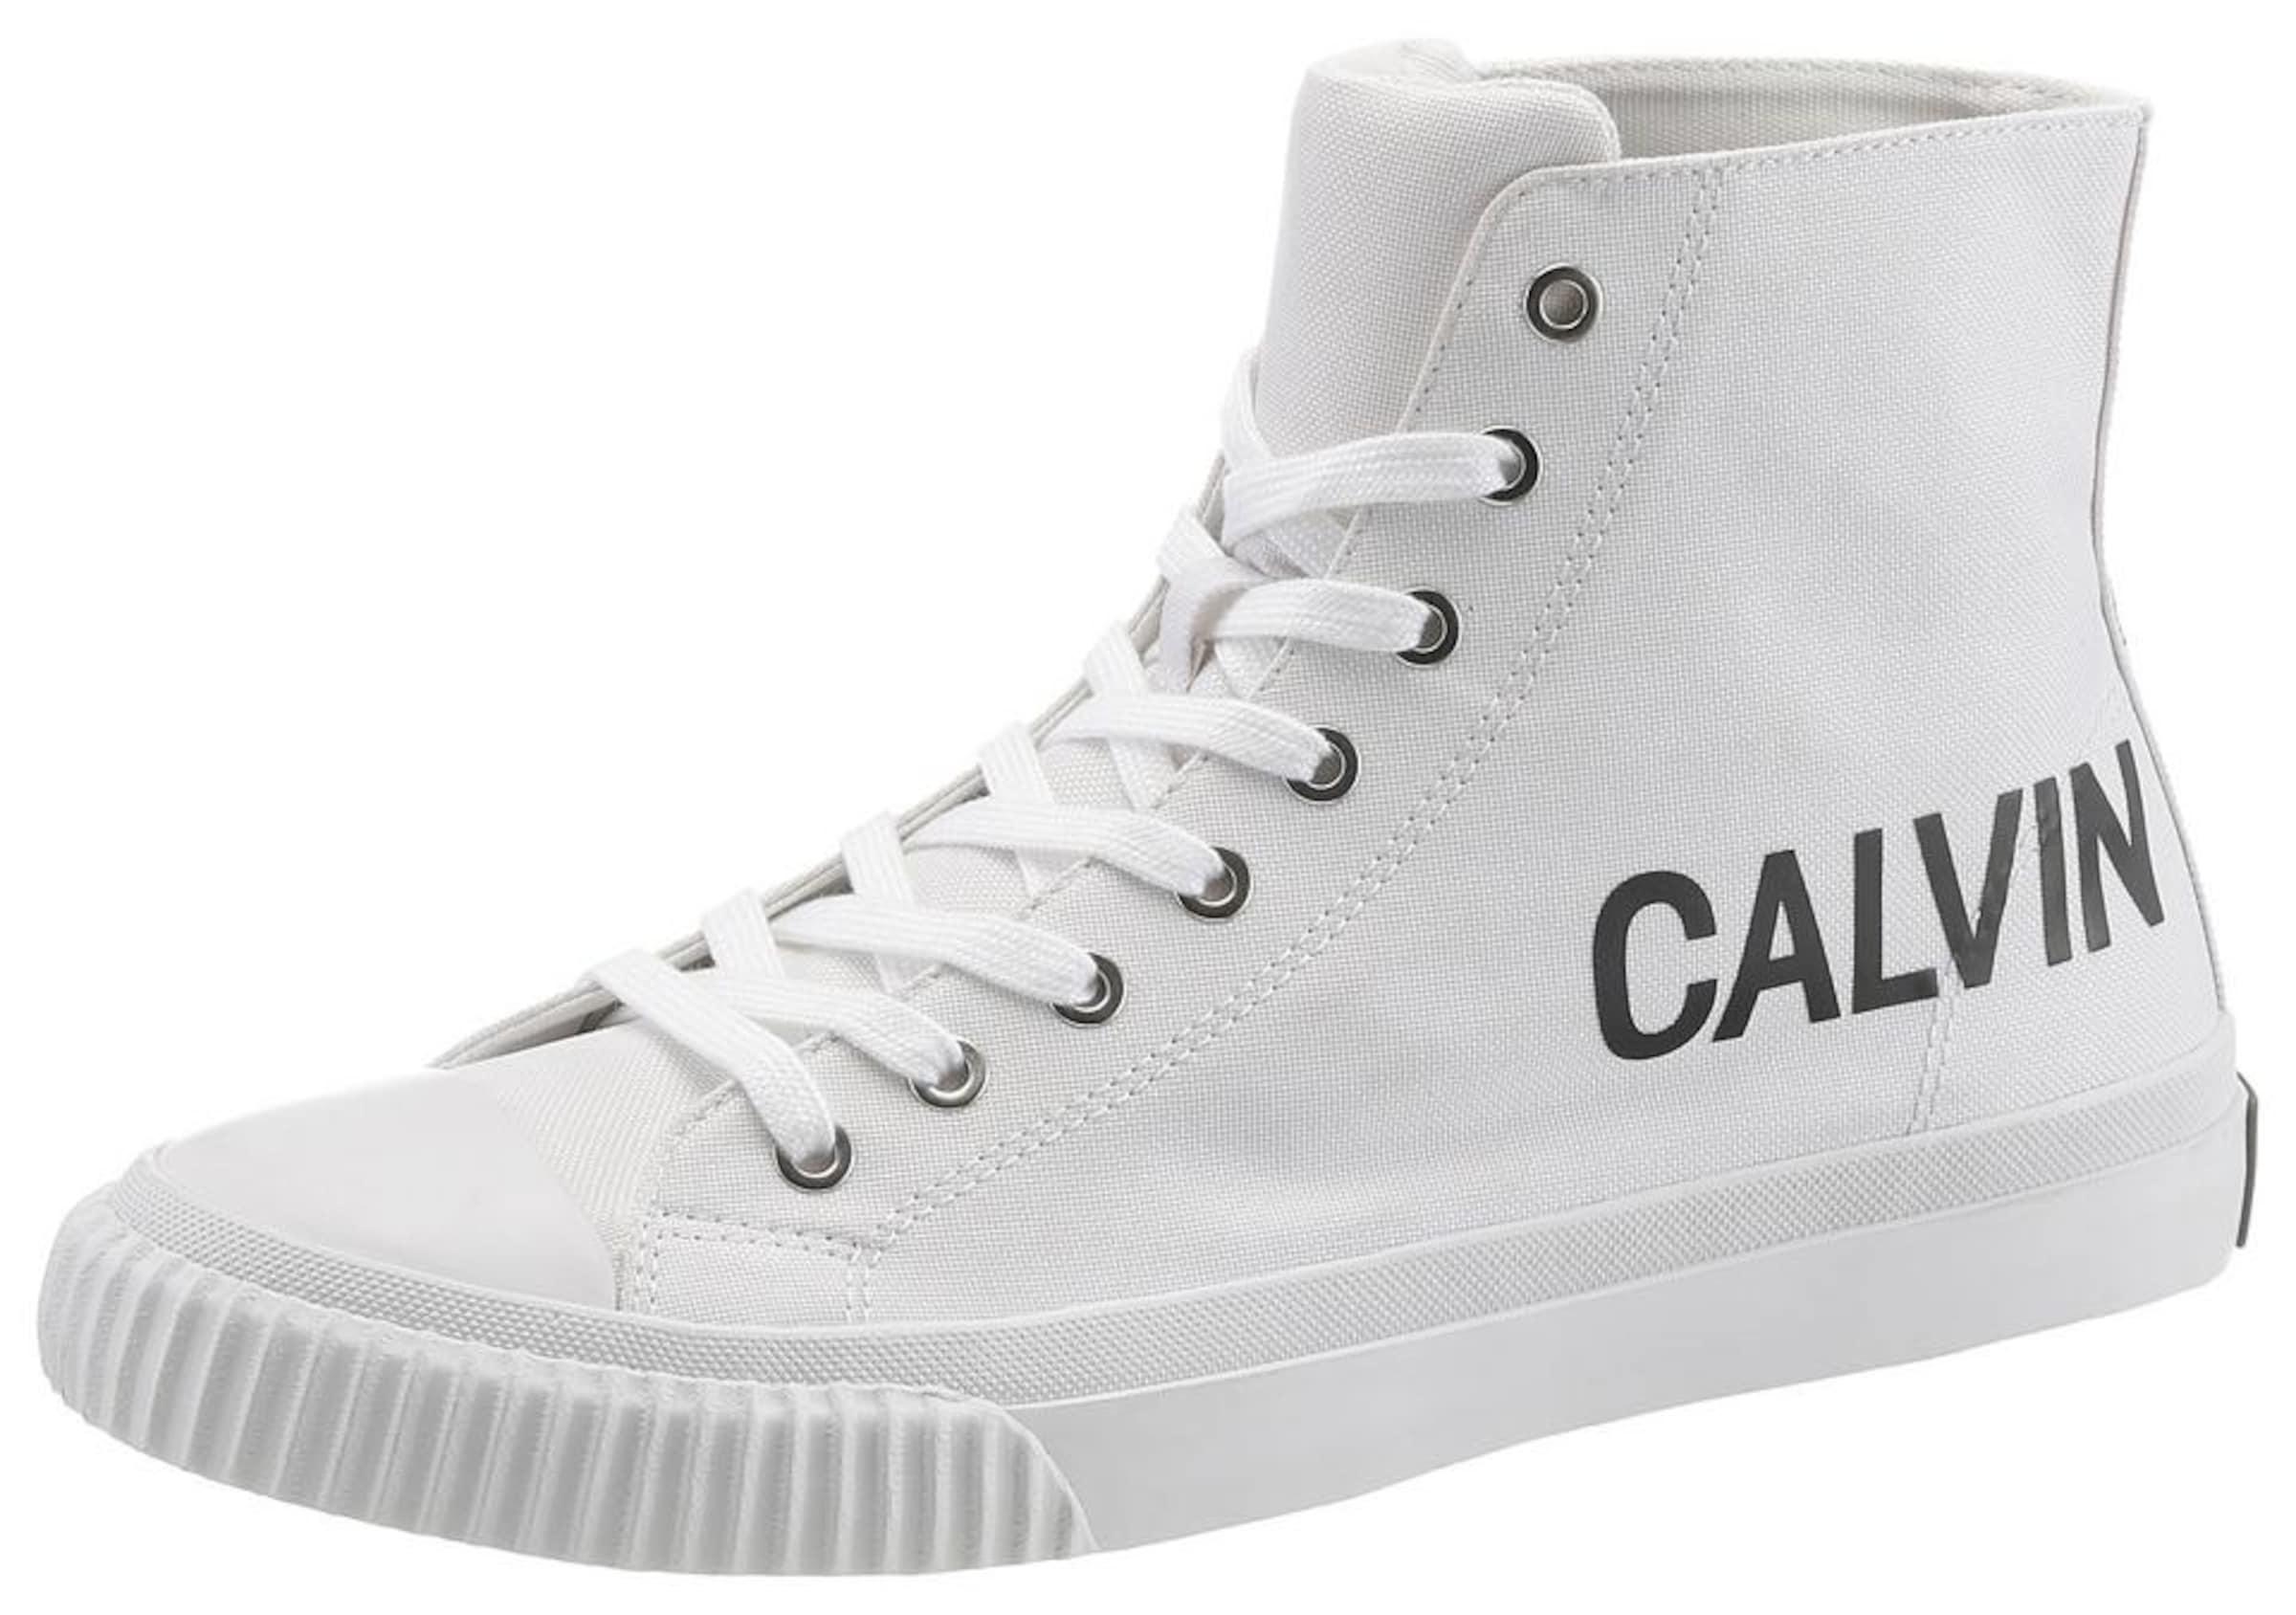 Sneaker Calvin In SchwarzWeiß Jeans 'lacopo' Klein NnPX0kZO8w